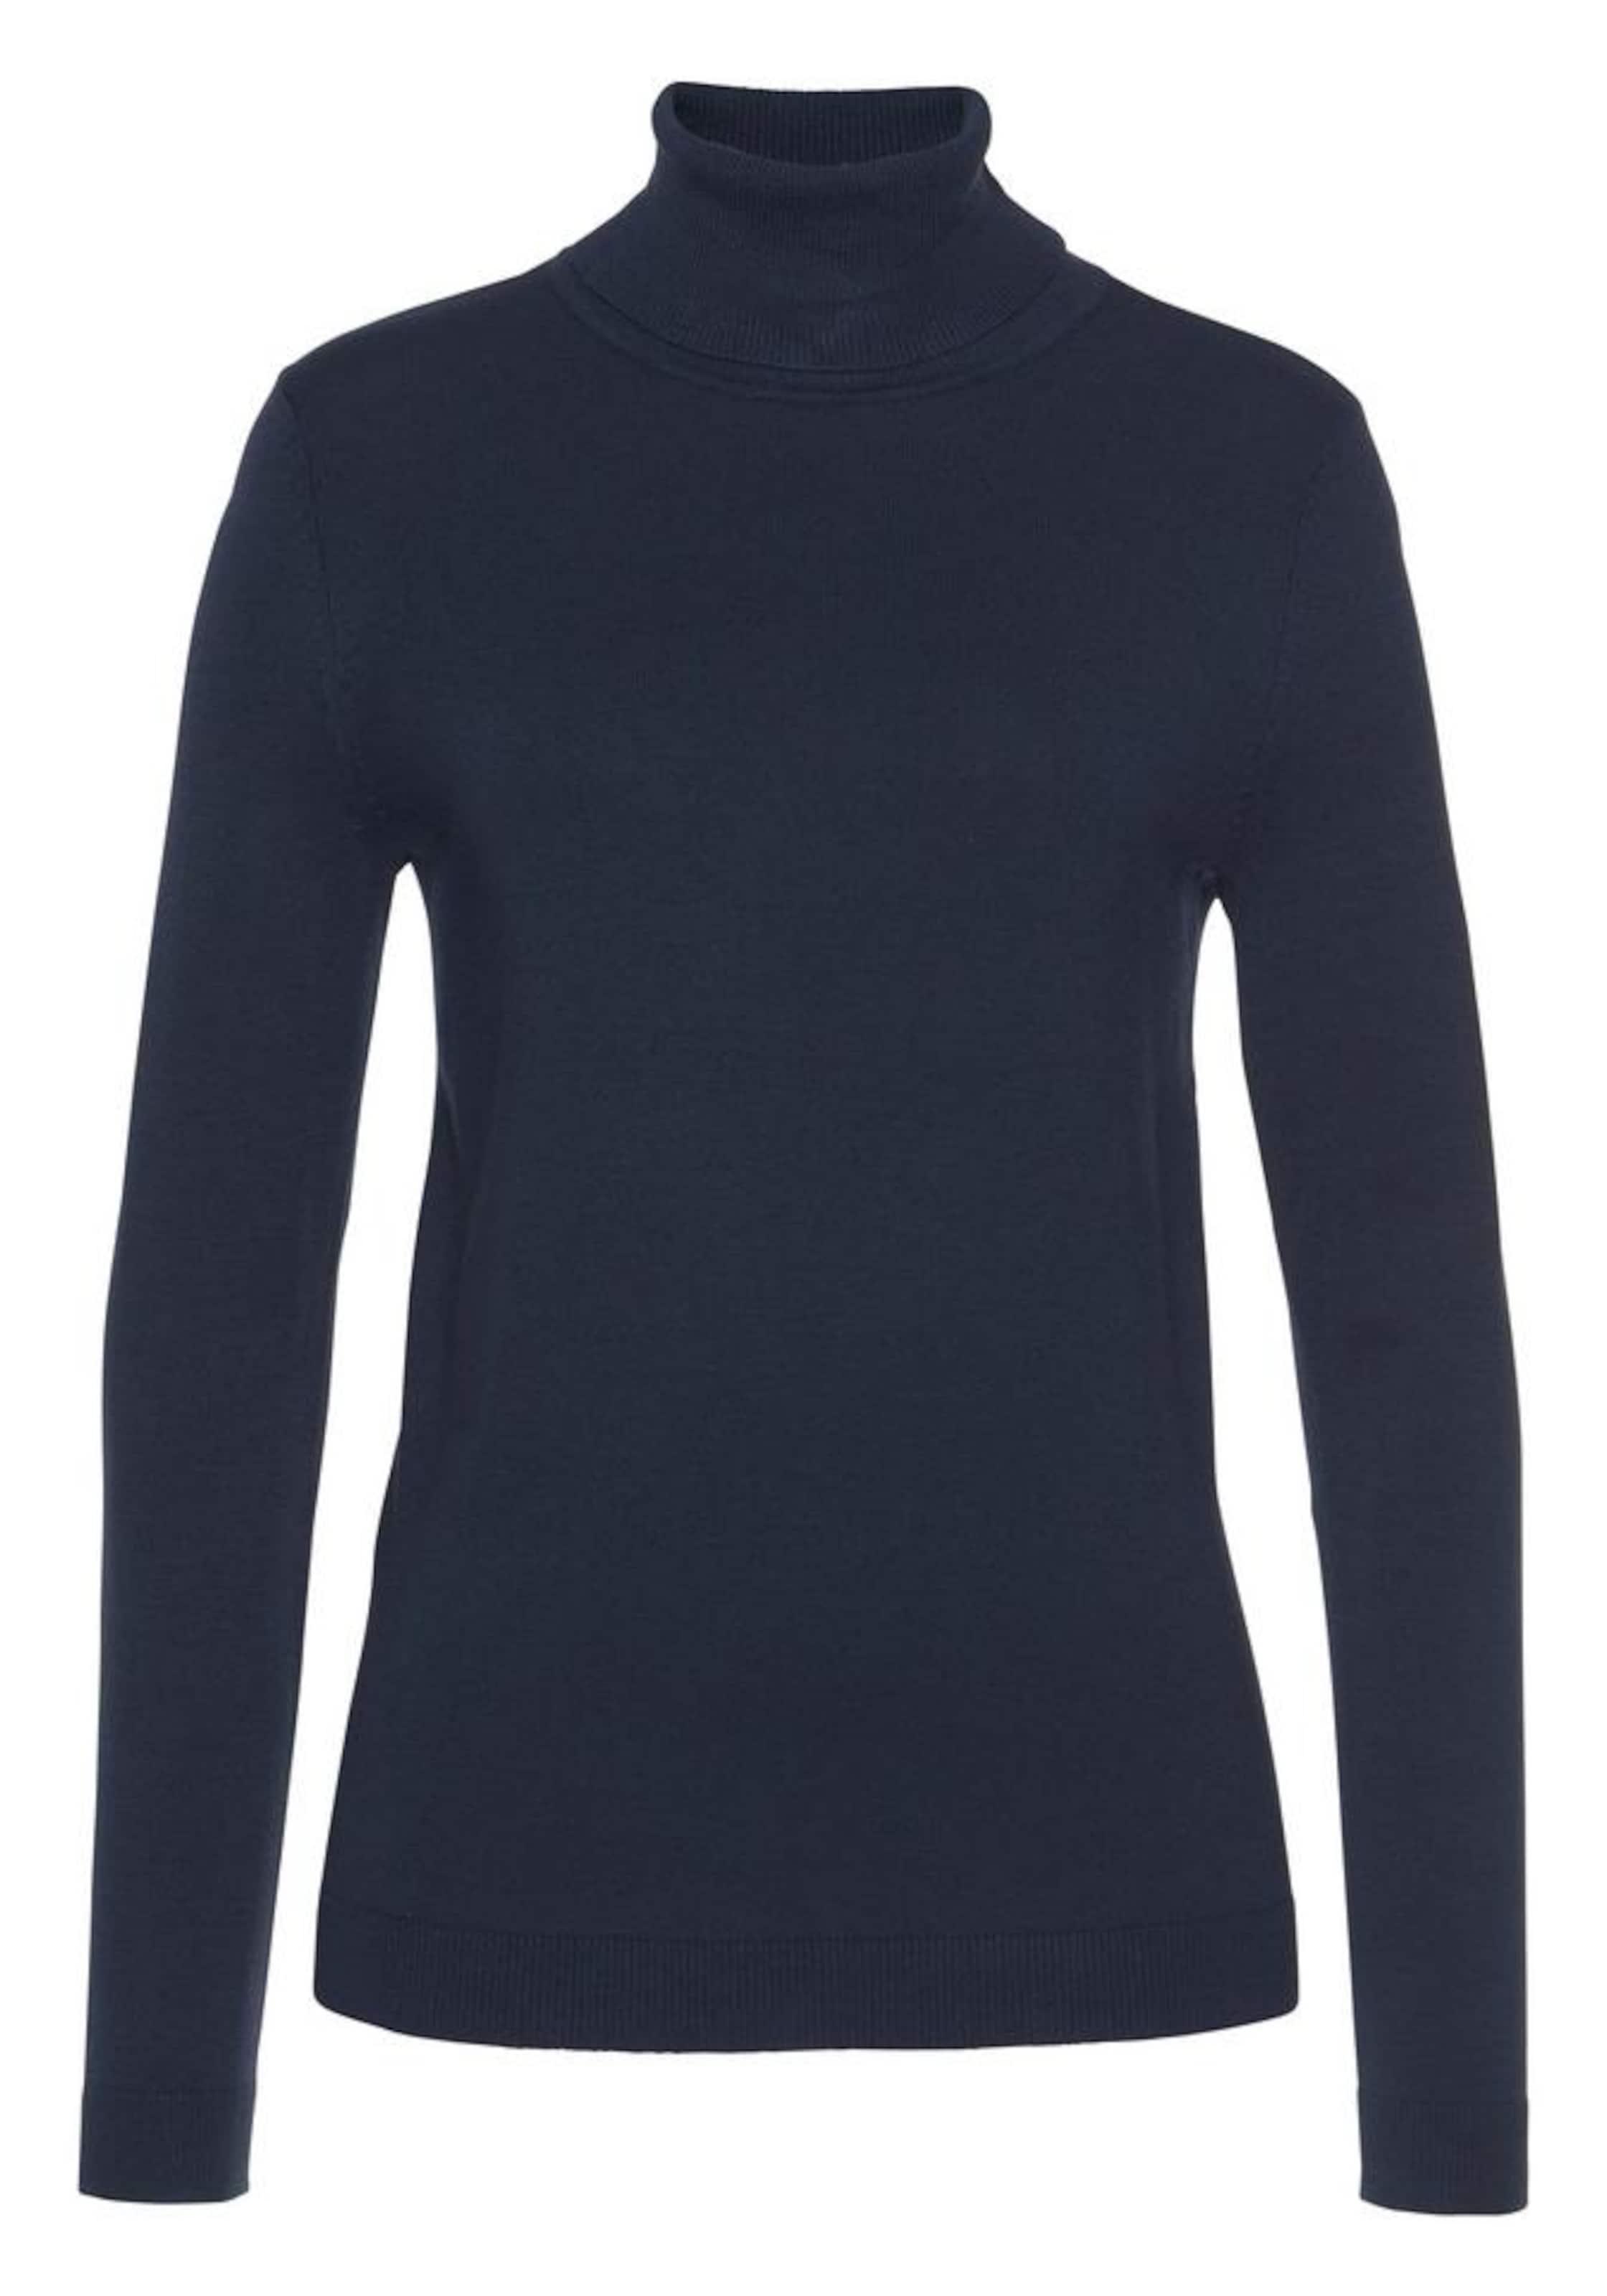 FLASHLIGHTS Rollkragenpullover in dunkelblau / grau